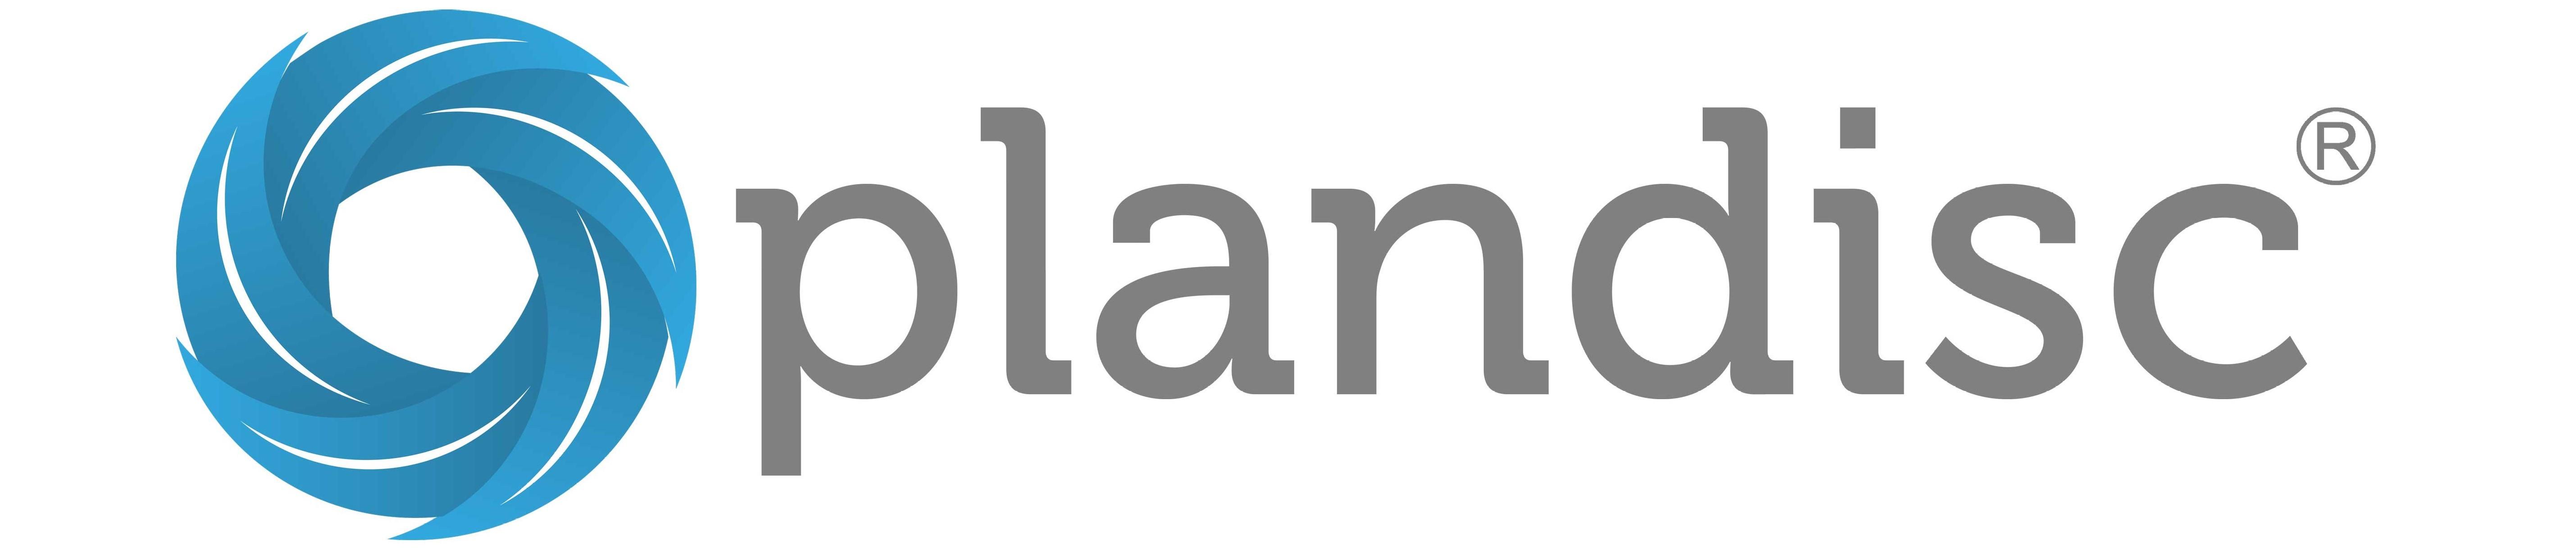 Plandisc - A circular annual operating plan